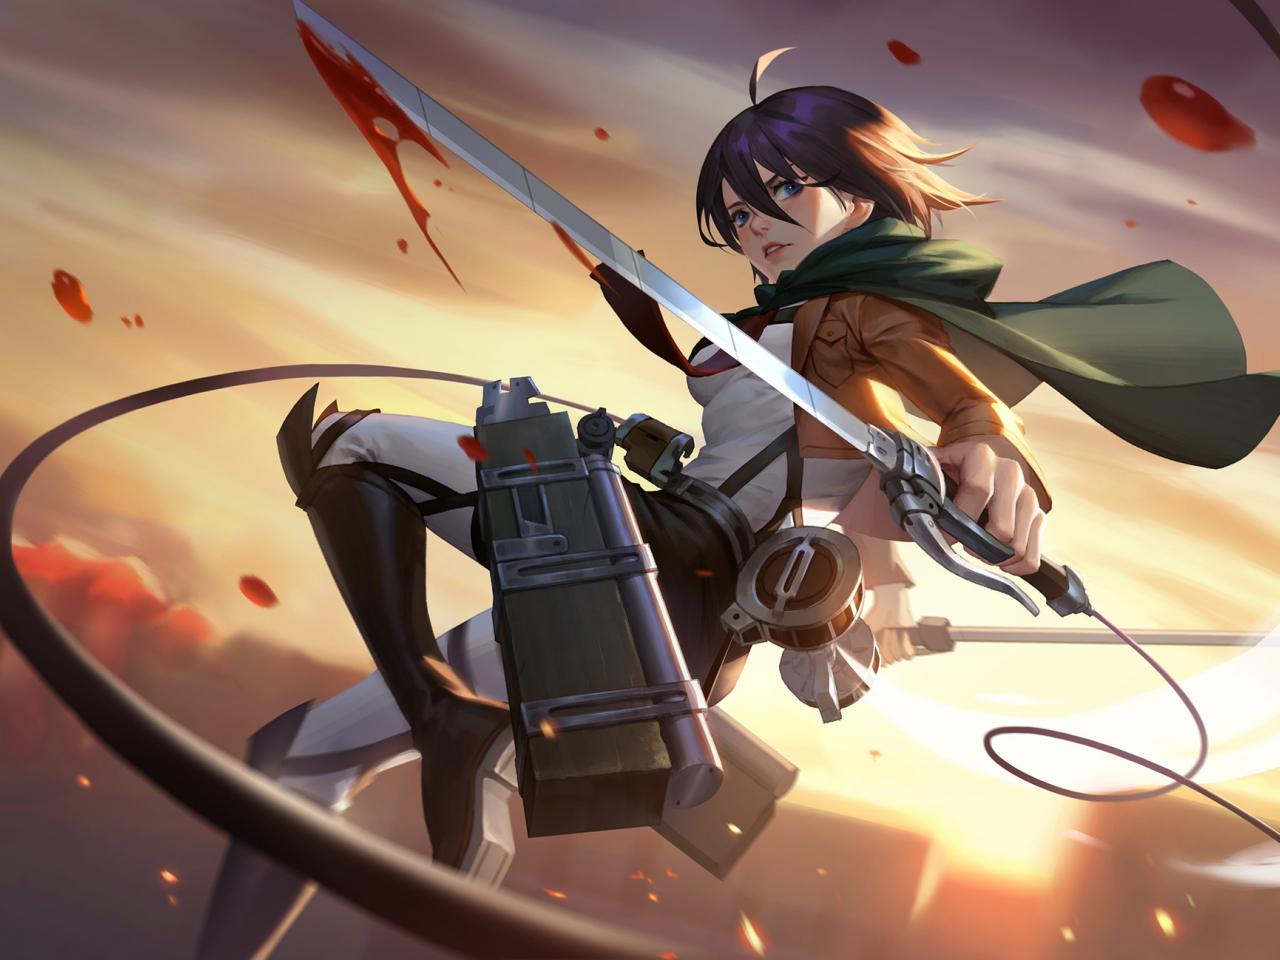 Desktop Wallpaper Mikasa Ackerman Attack On Titan Art Anime Girl Hd Image Picture Background 92af0e